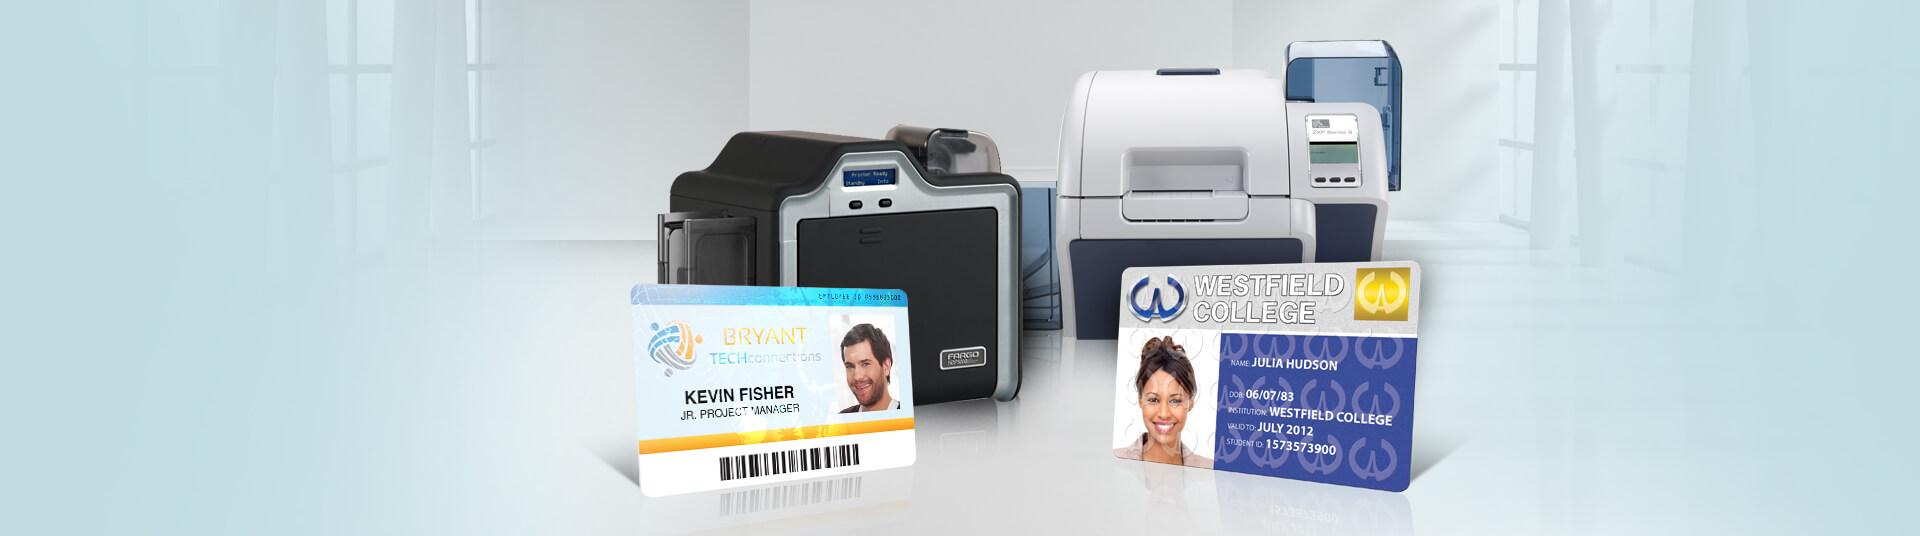 Identification Card Printers